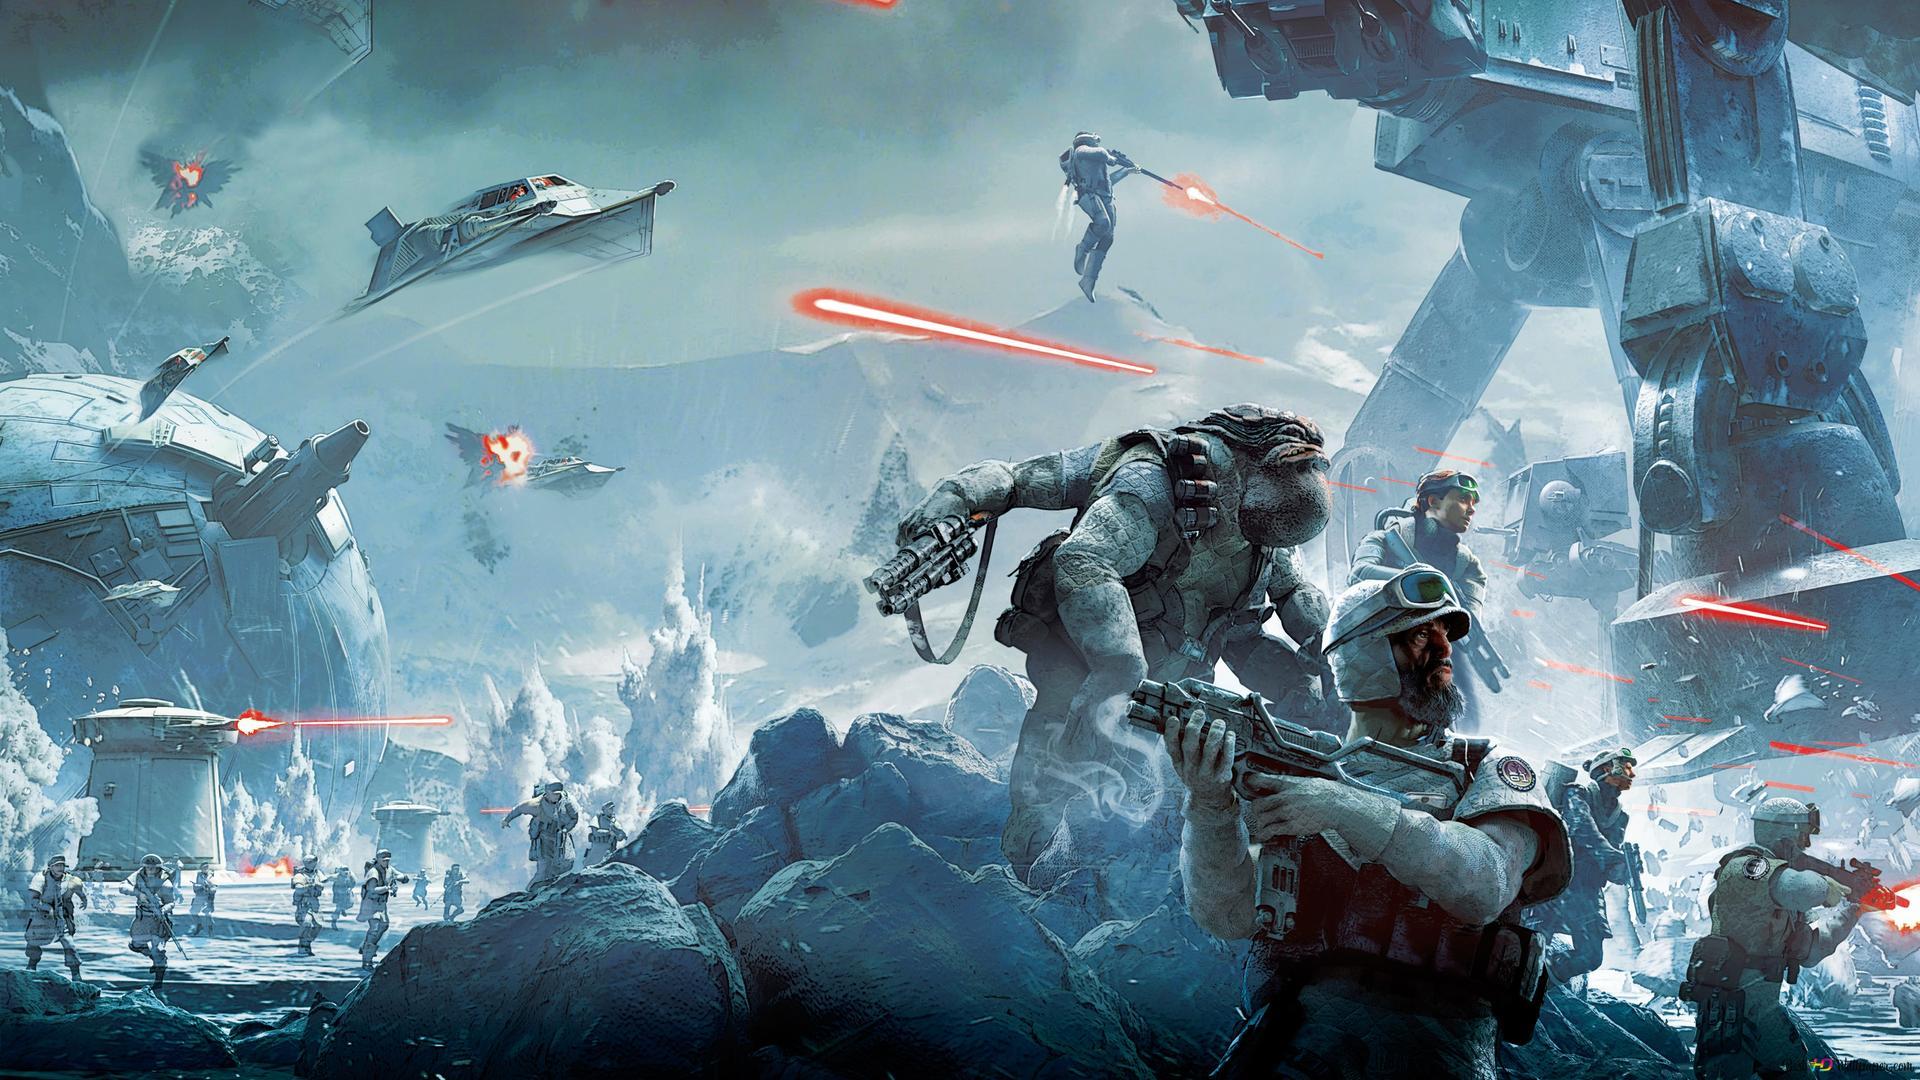 Star Wars Battlefront Dammer Company Hd